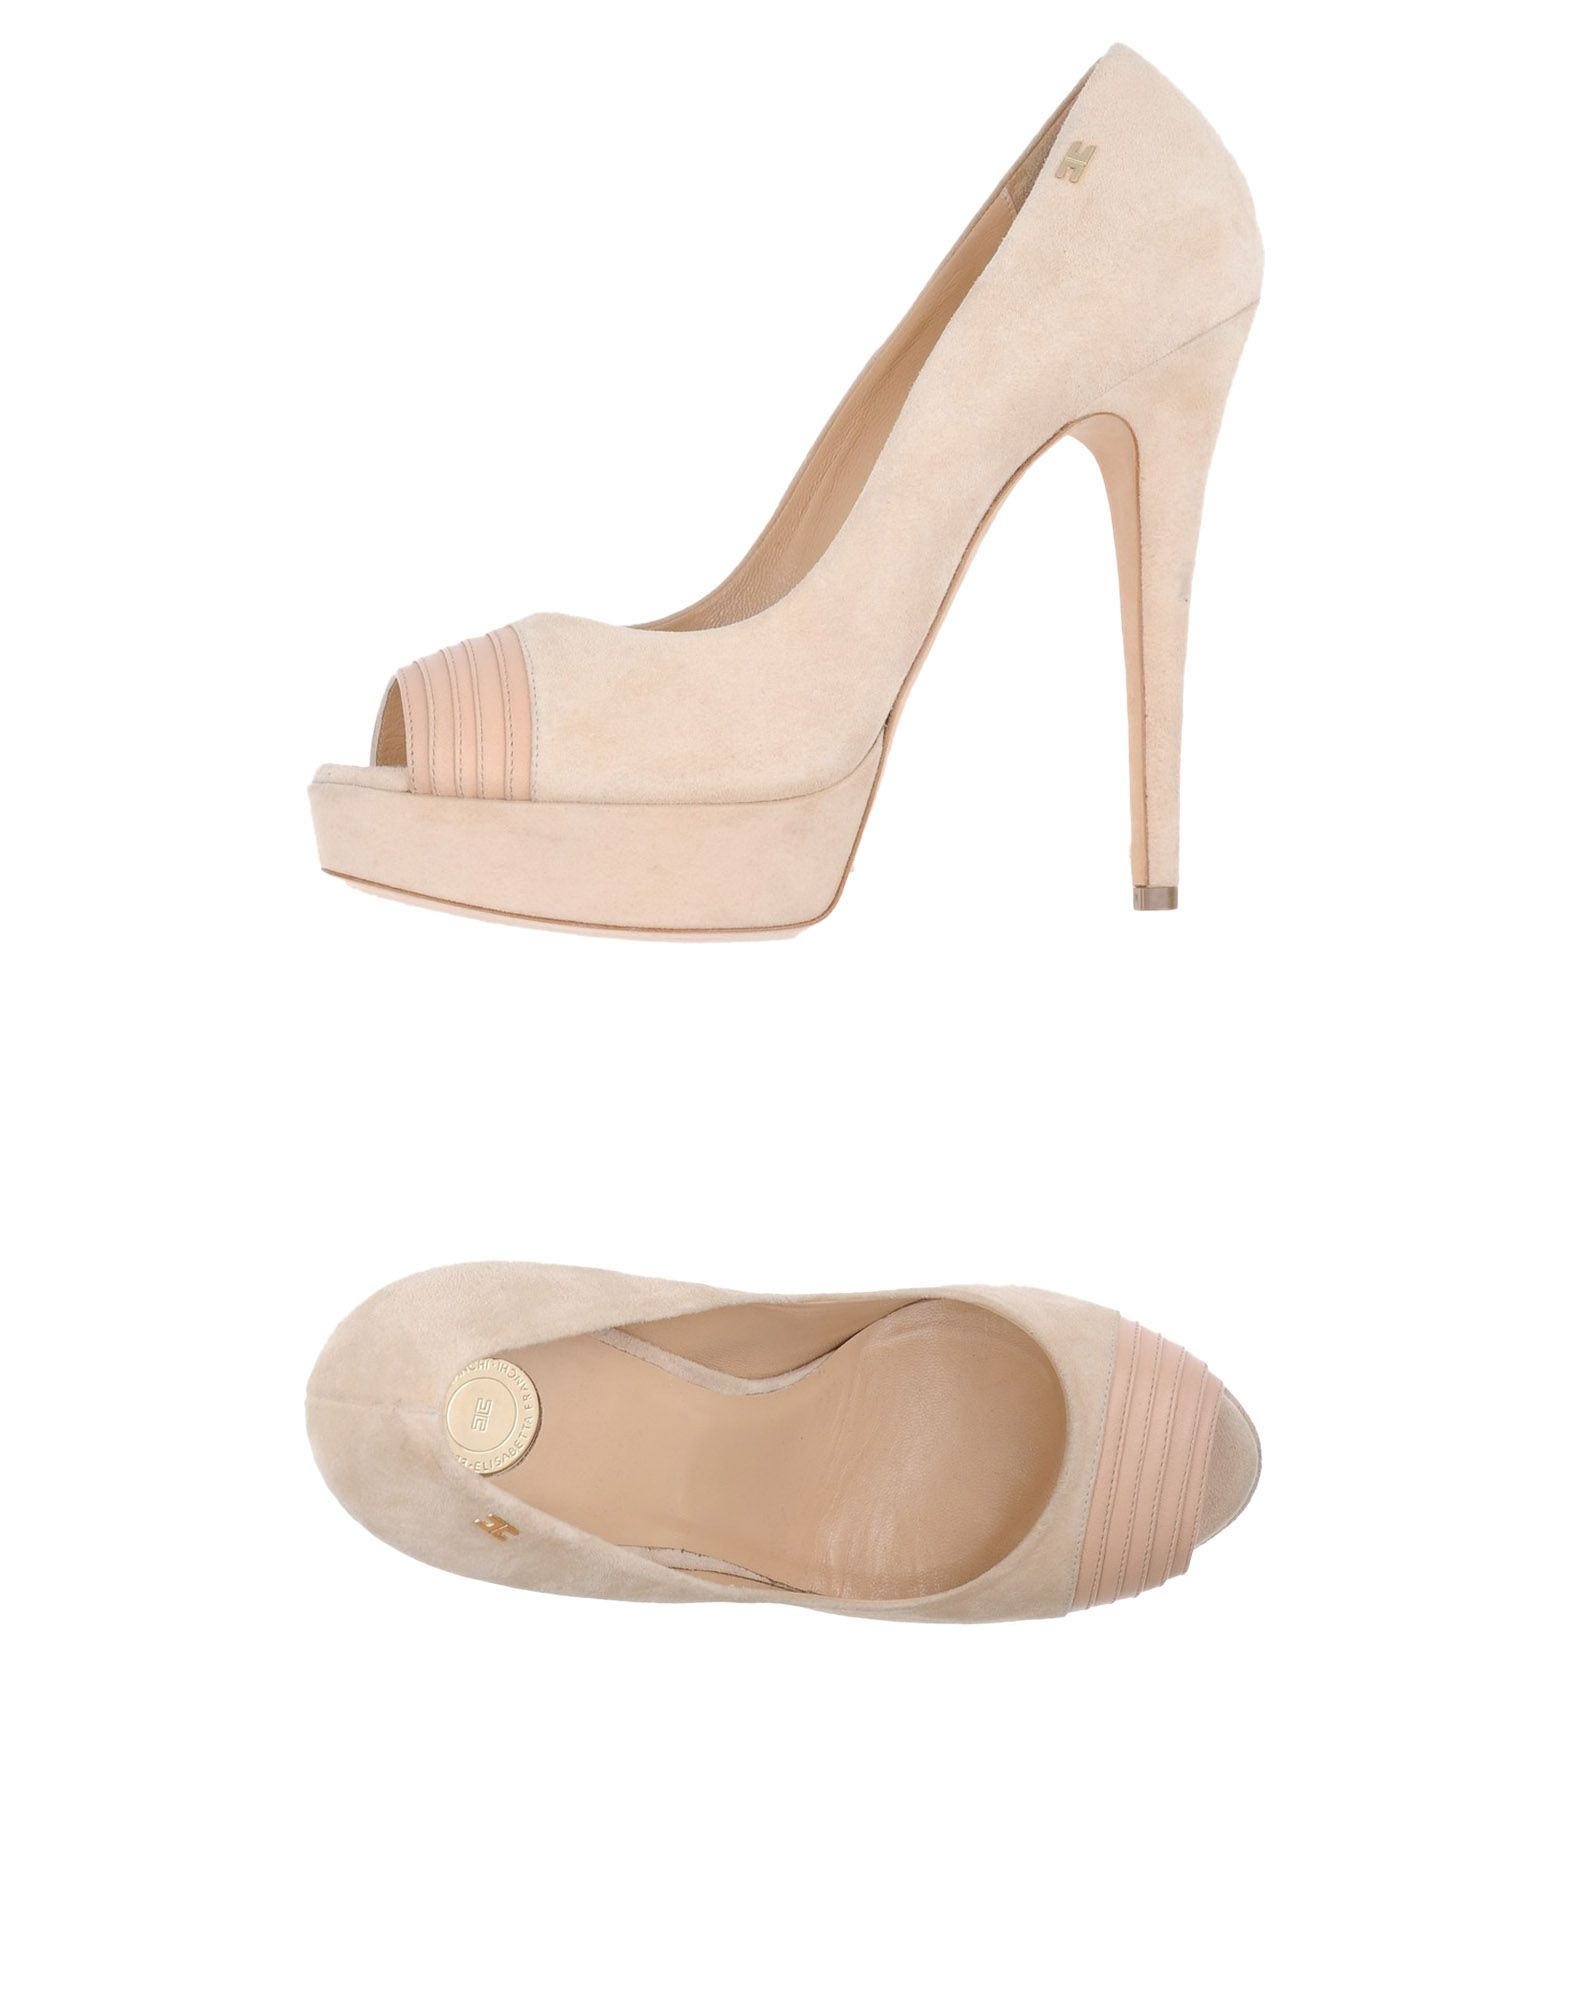 elisabetta franchi туфли с контрастной отделкой ELISABETTA FRANCHI Туфли